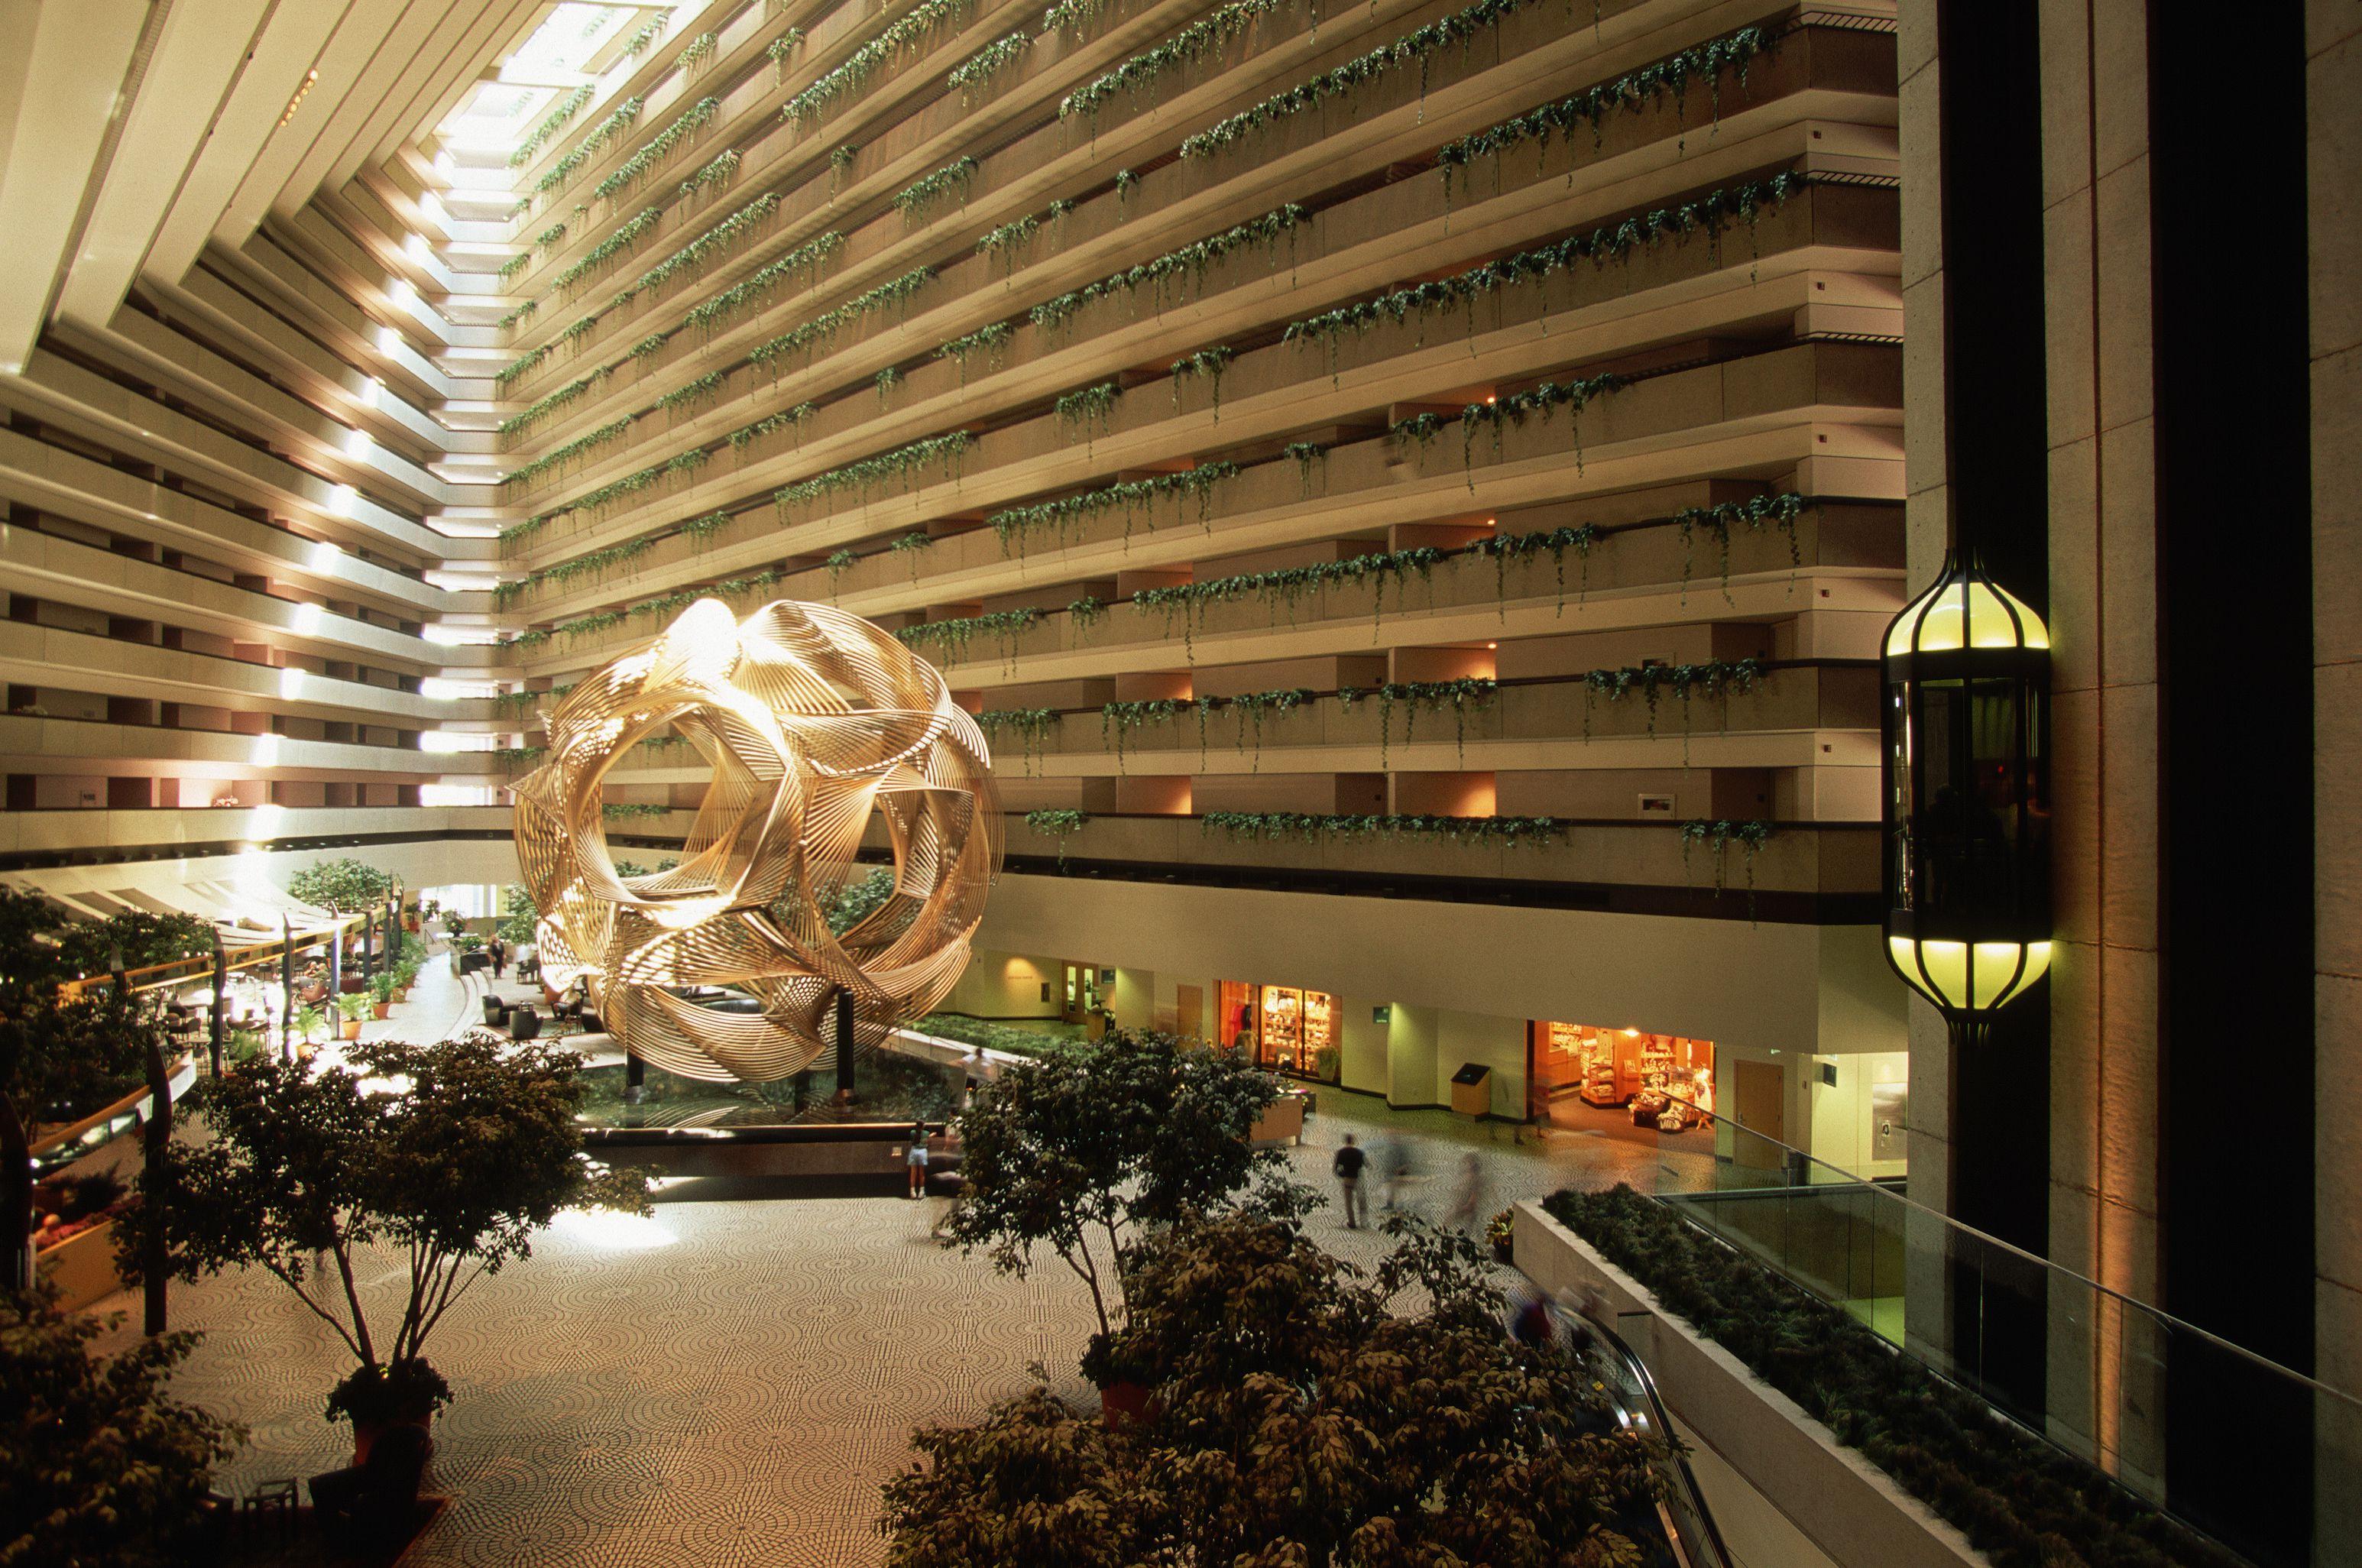 San Francisco Hotels With Views